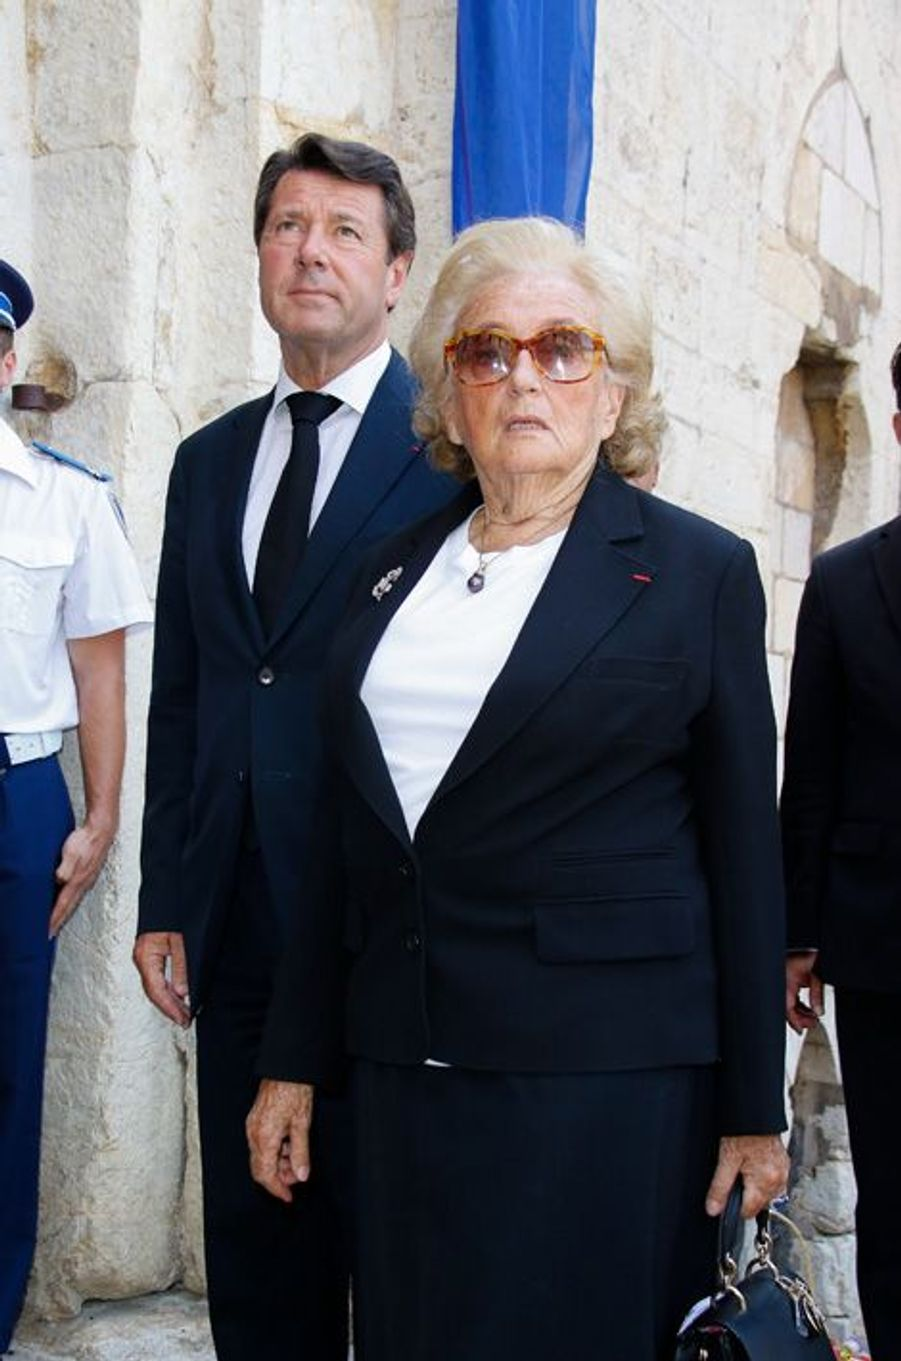 Christian Estrosi et Bernadette Chirac